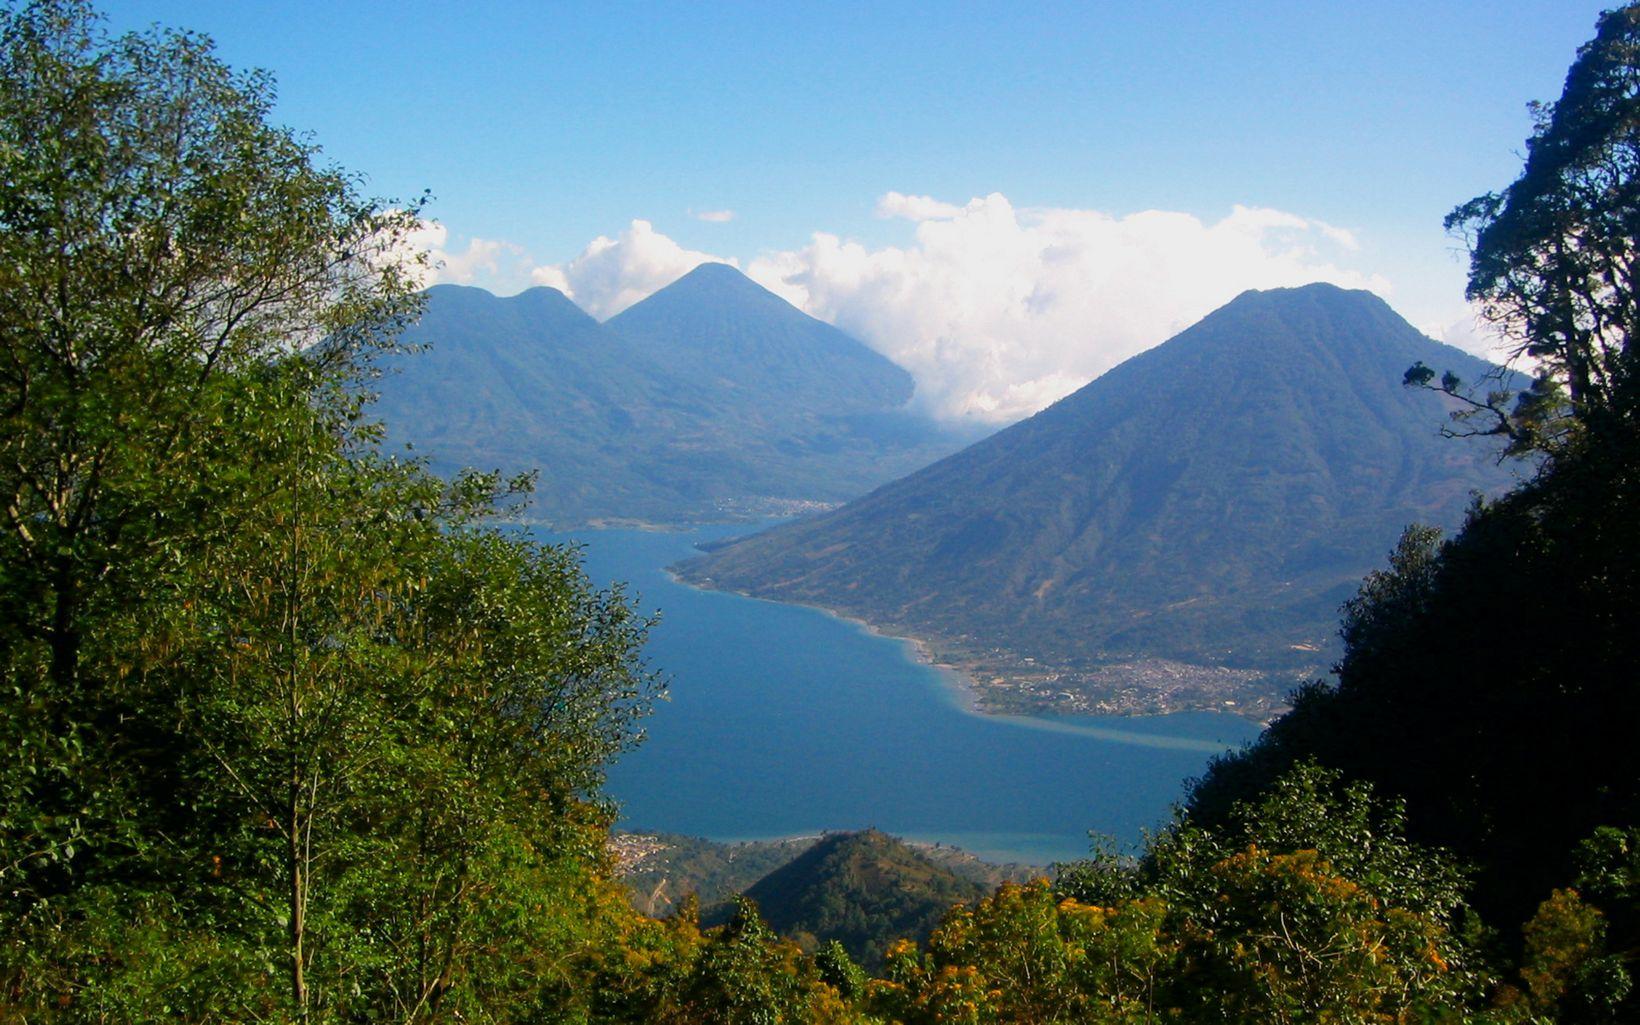 tierras altas de Guatemala, Centro América